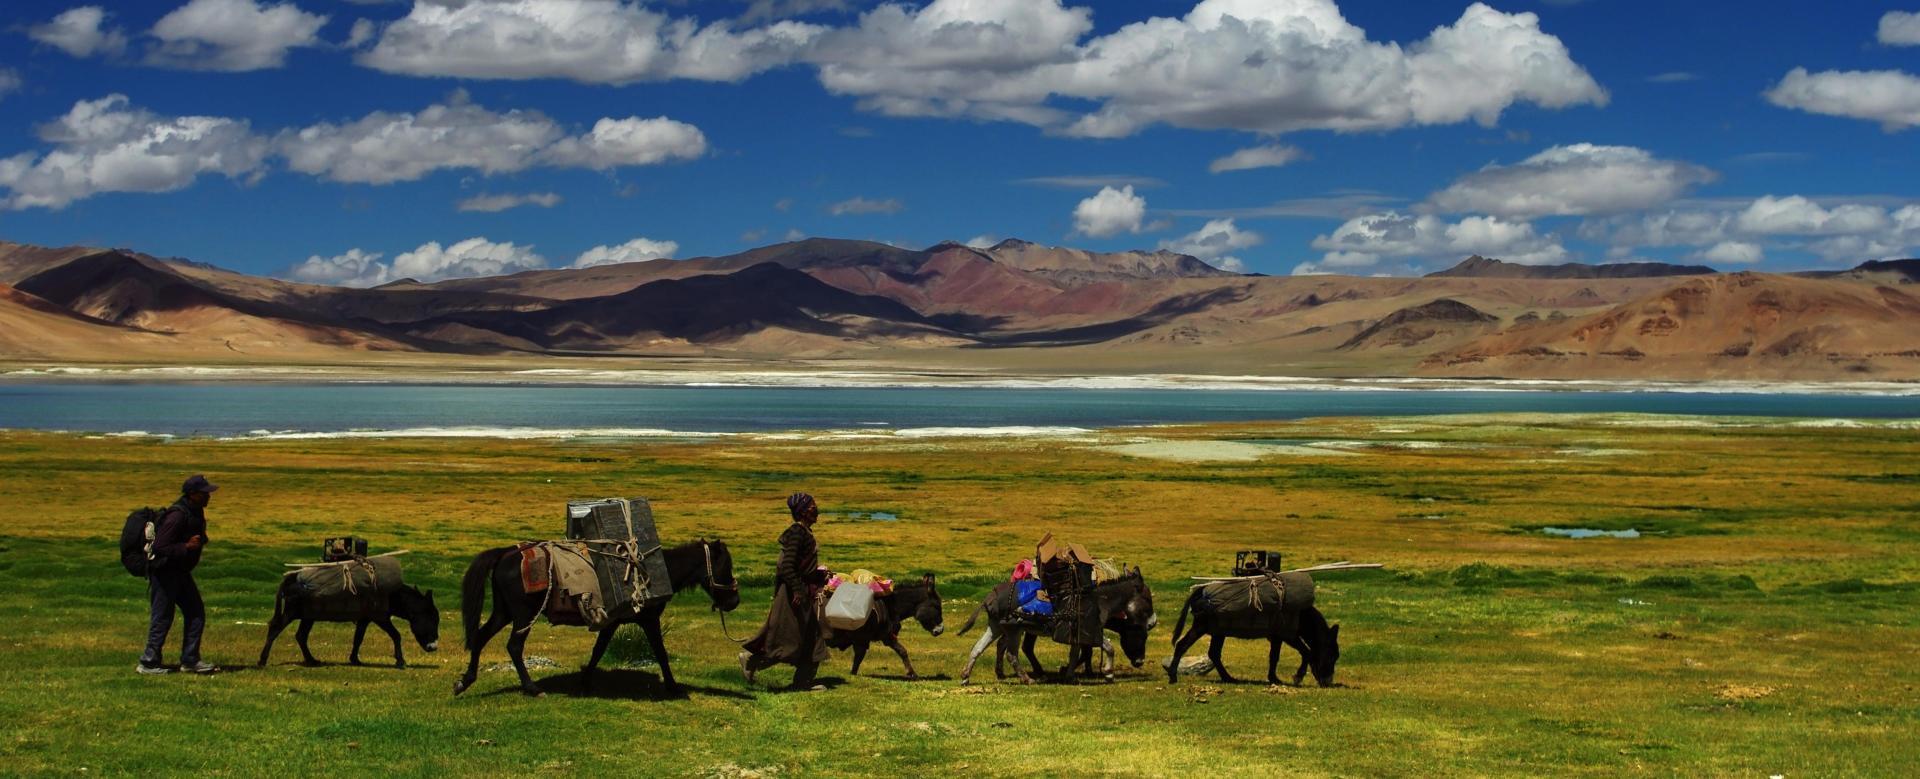 Voyage à pied Inde : Grand trek ladakhi, de l'indus au tsomoriri